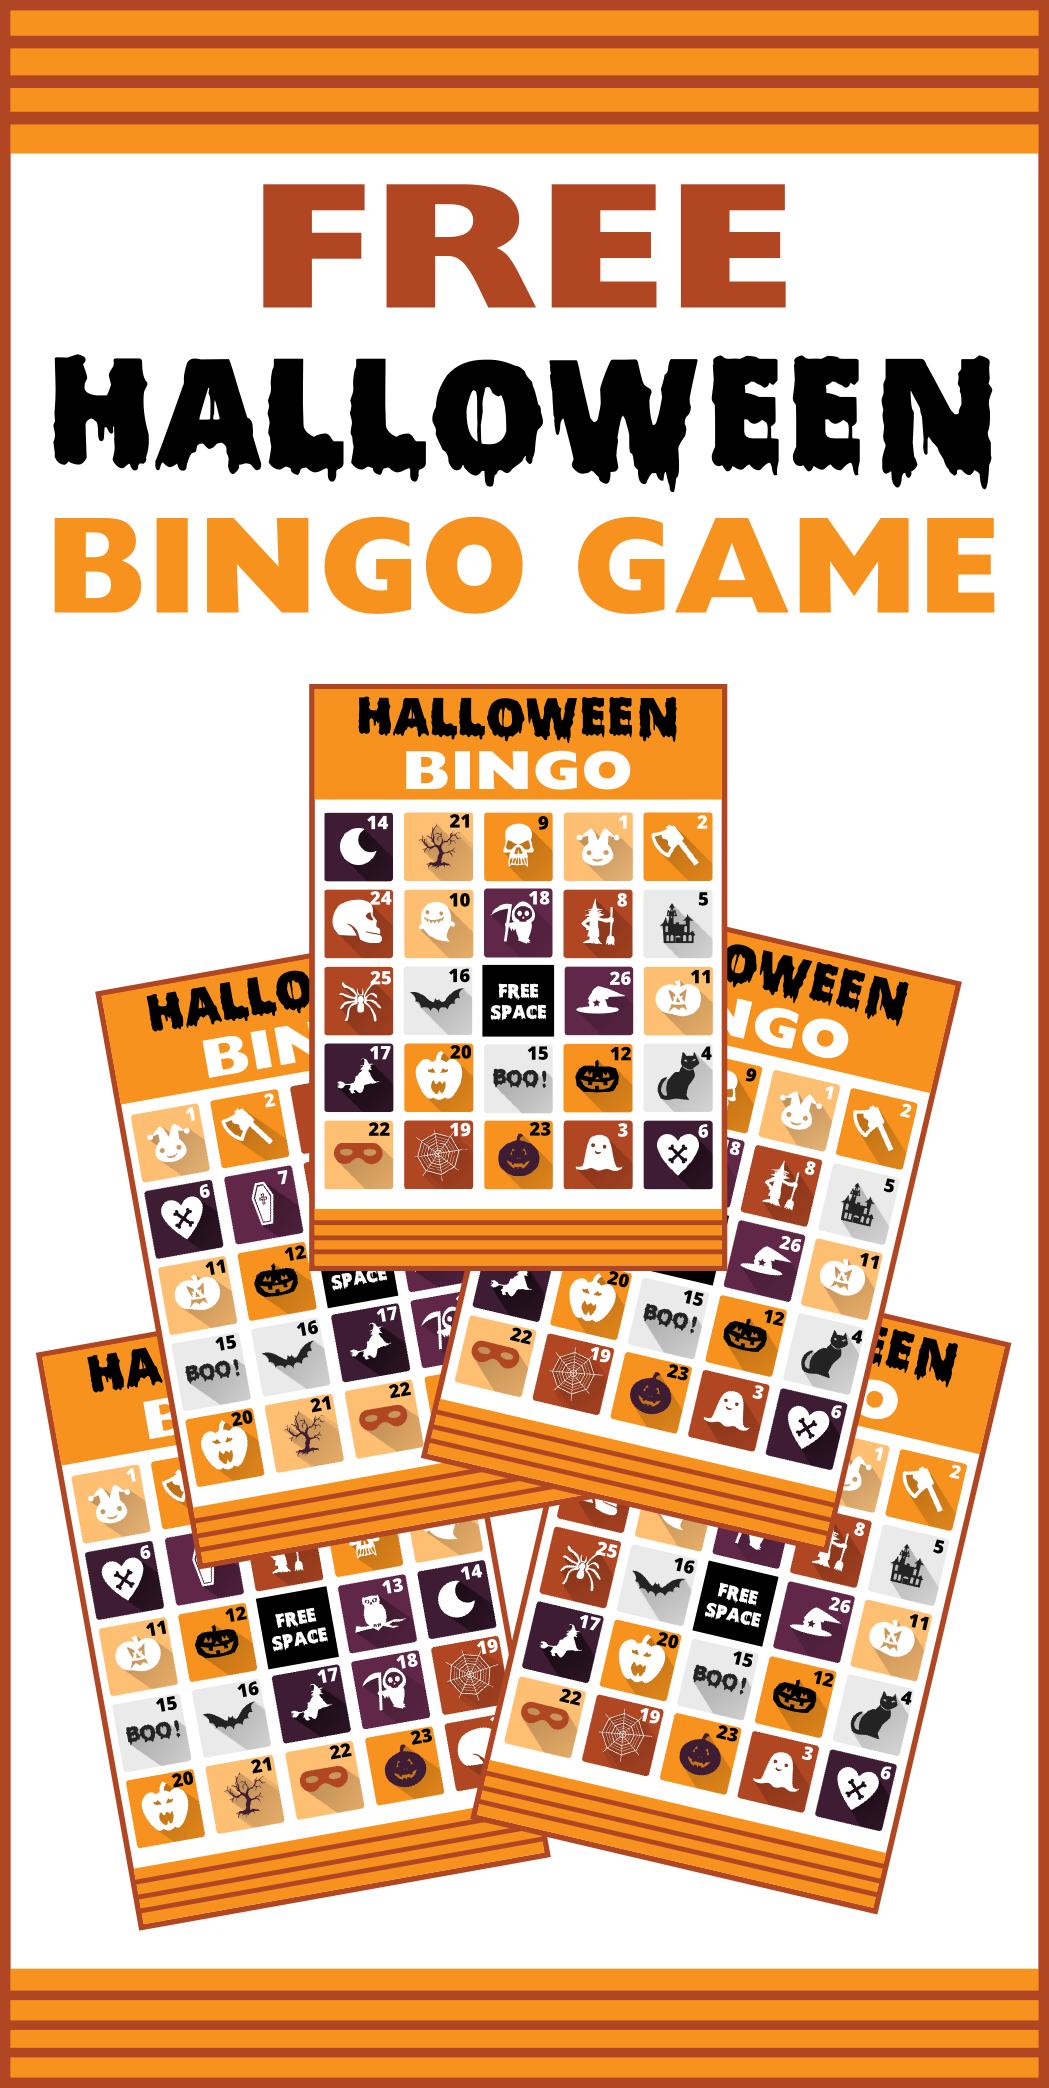 Free Printable Halloween Bingo Cards | Catch My Party - Free Printable Halloween Bingo Cards